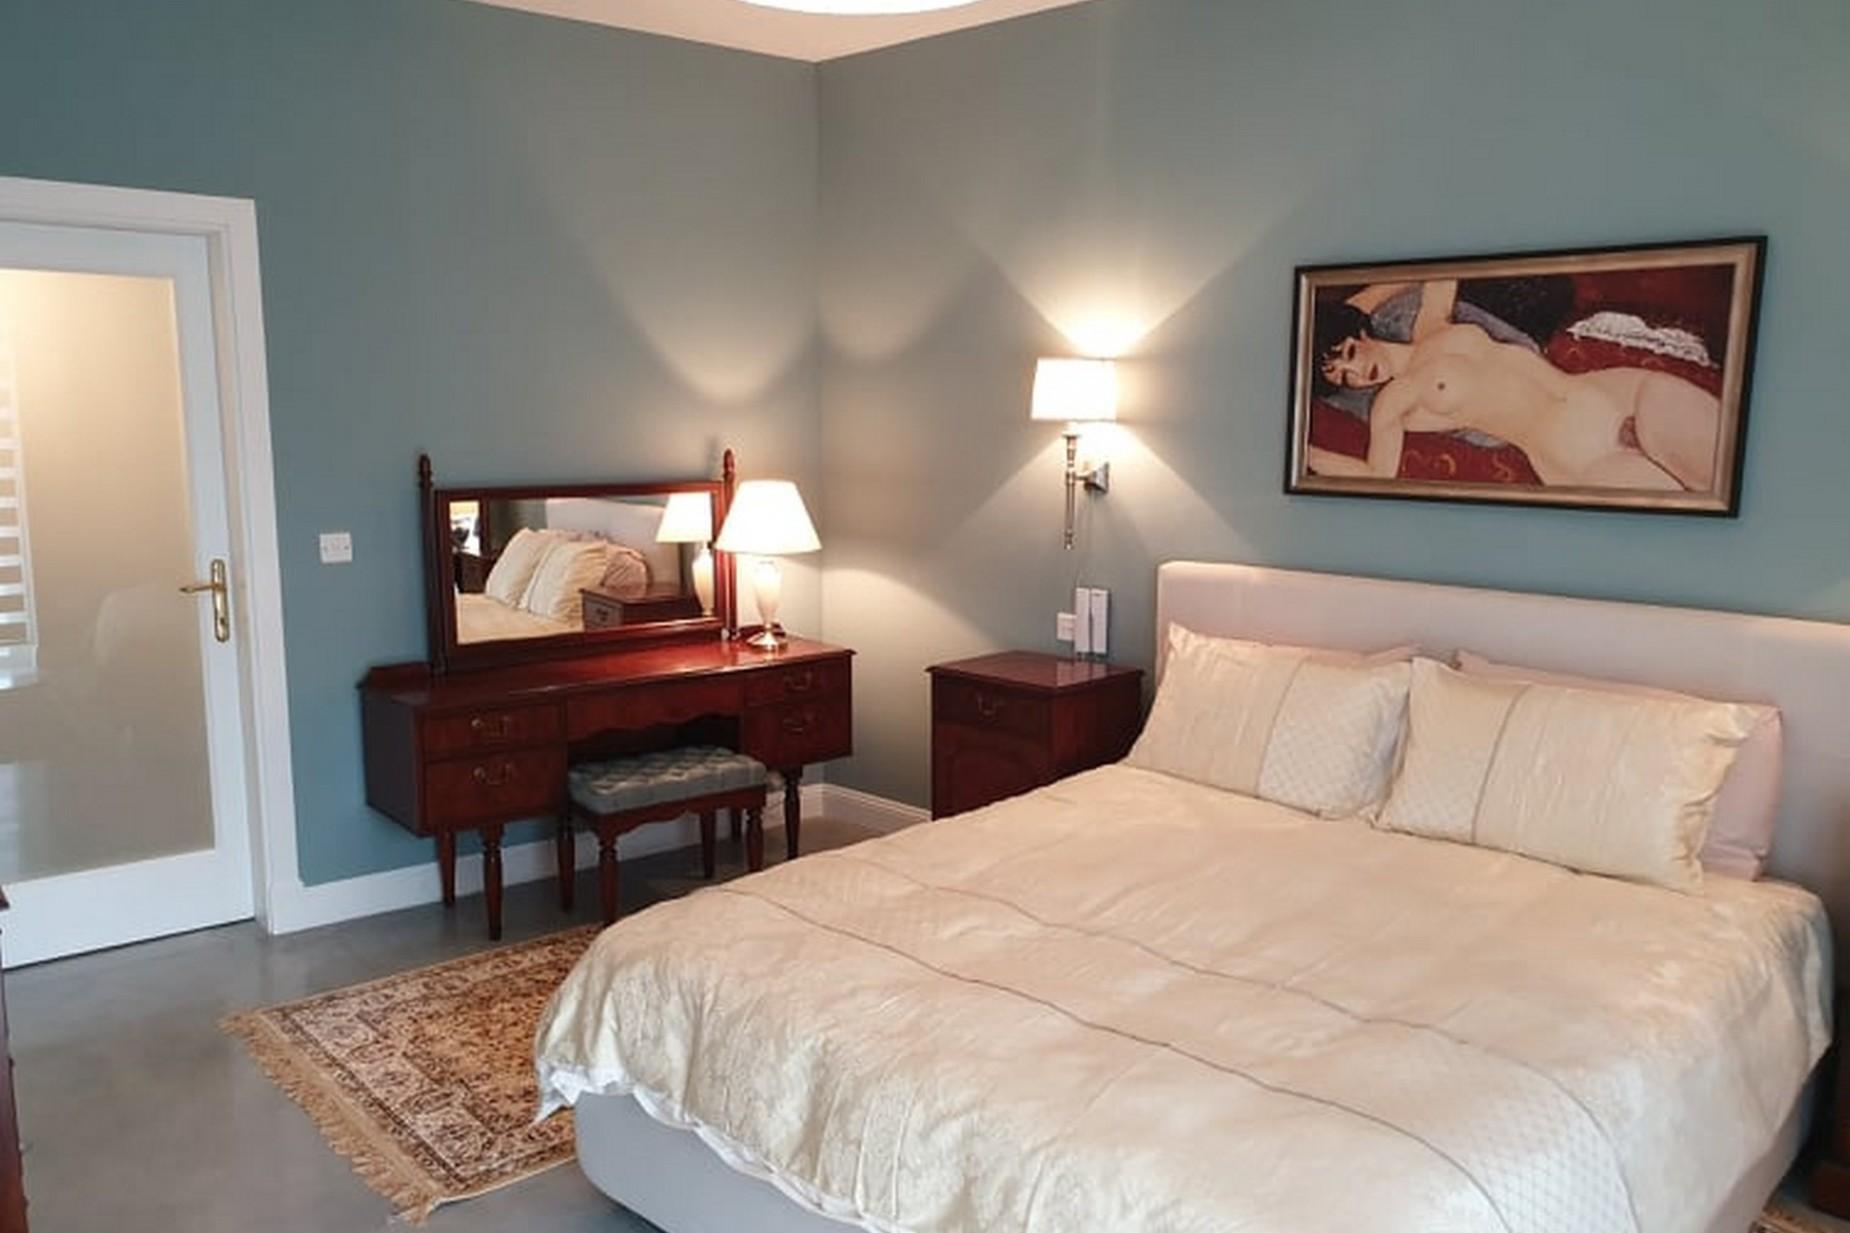 3 bed Apartment For Rent in Birkirkara, Birkirkara - thumb 25